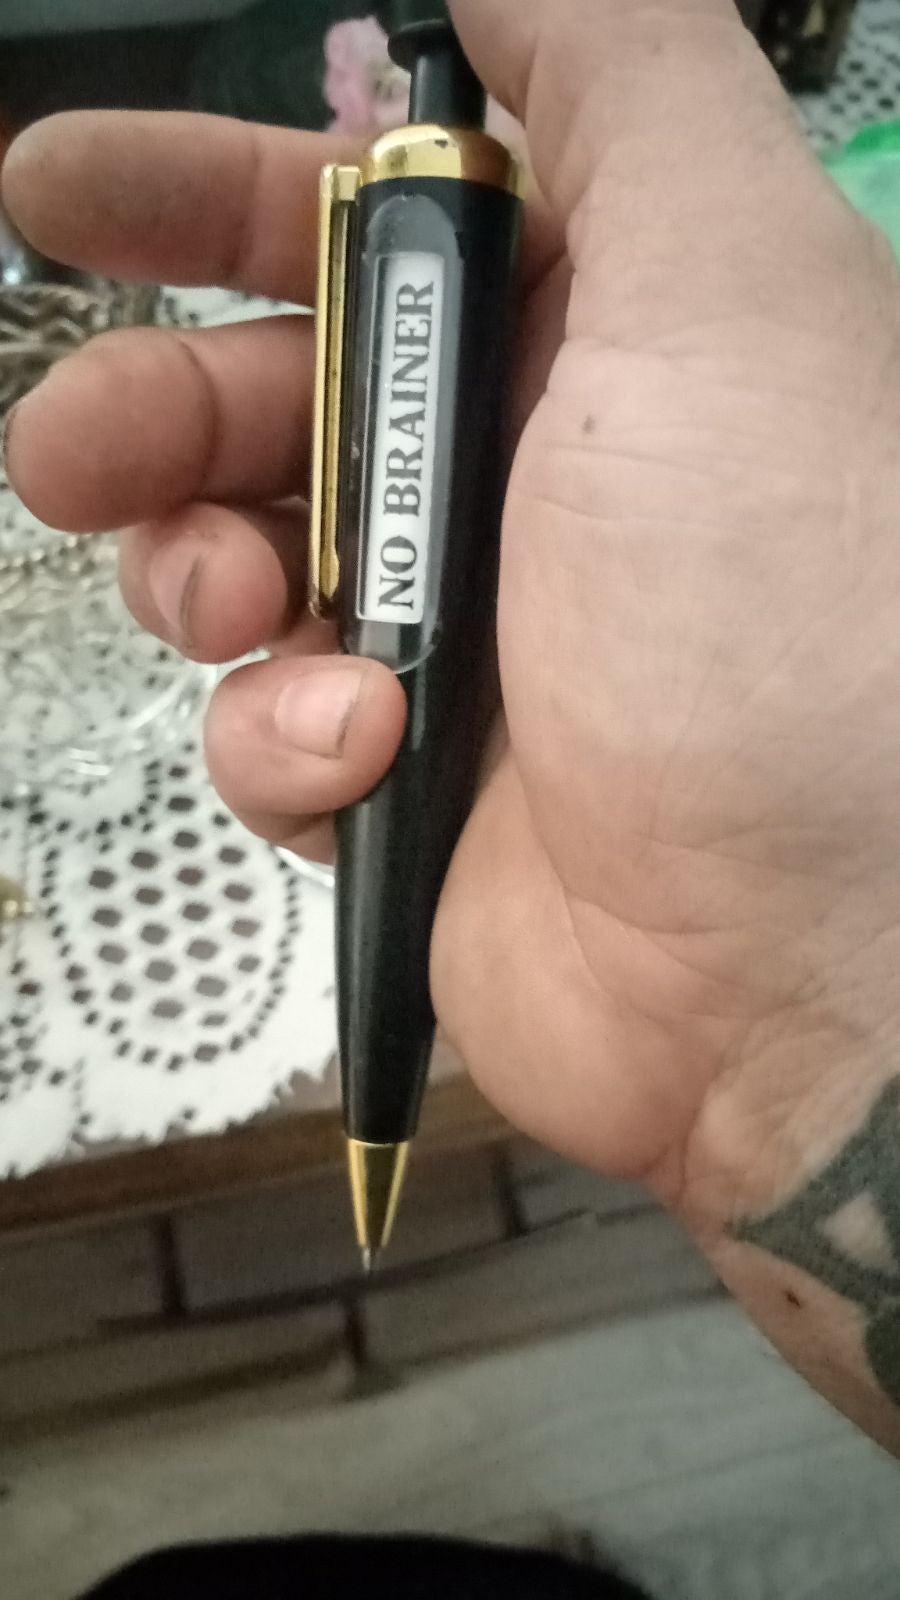 Magic answering pen jumbo